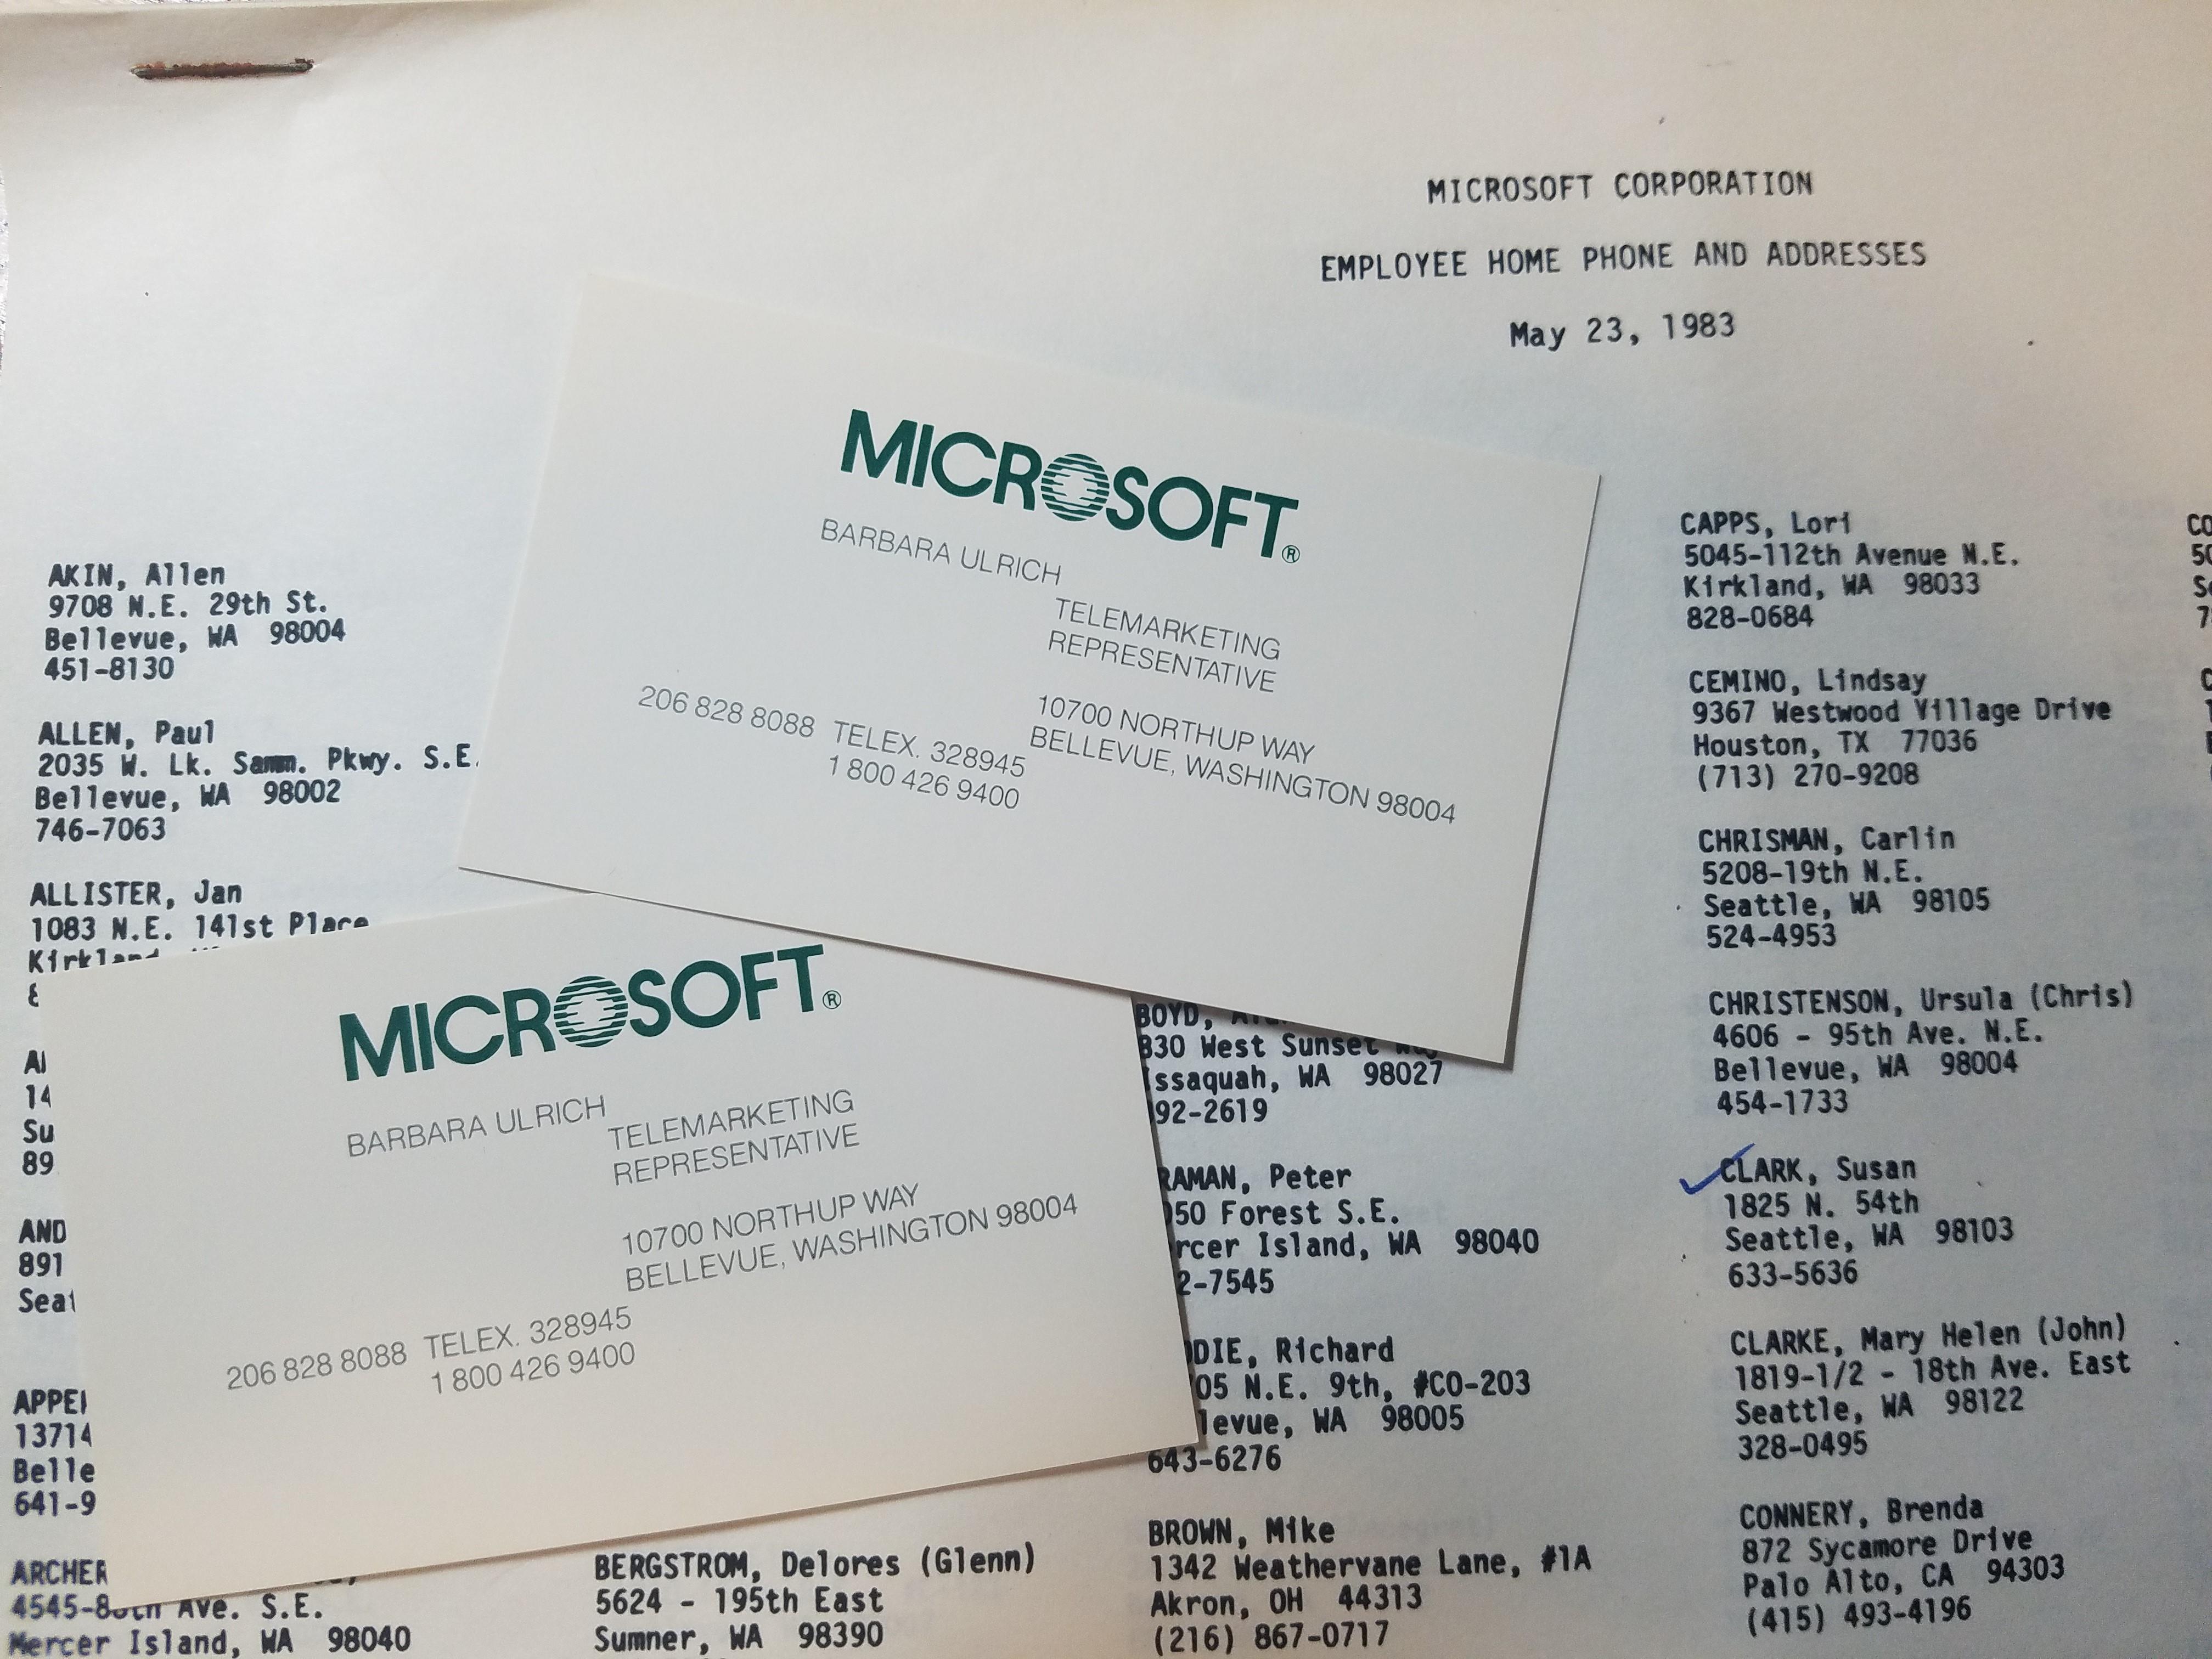 Microsoft phone list 1983